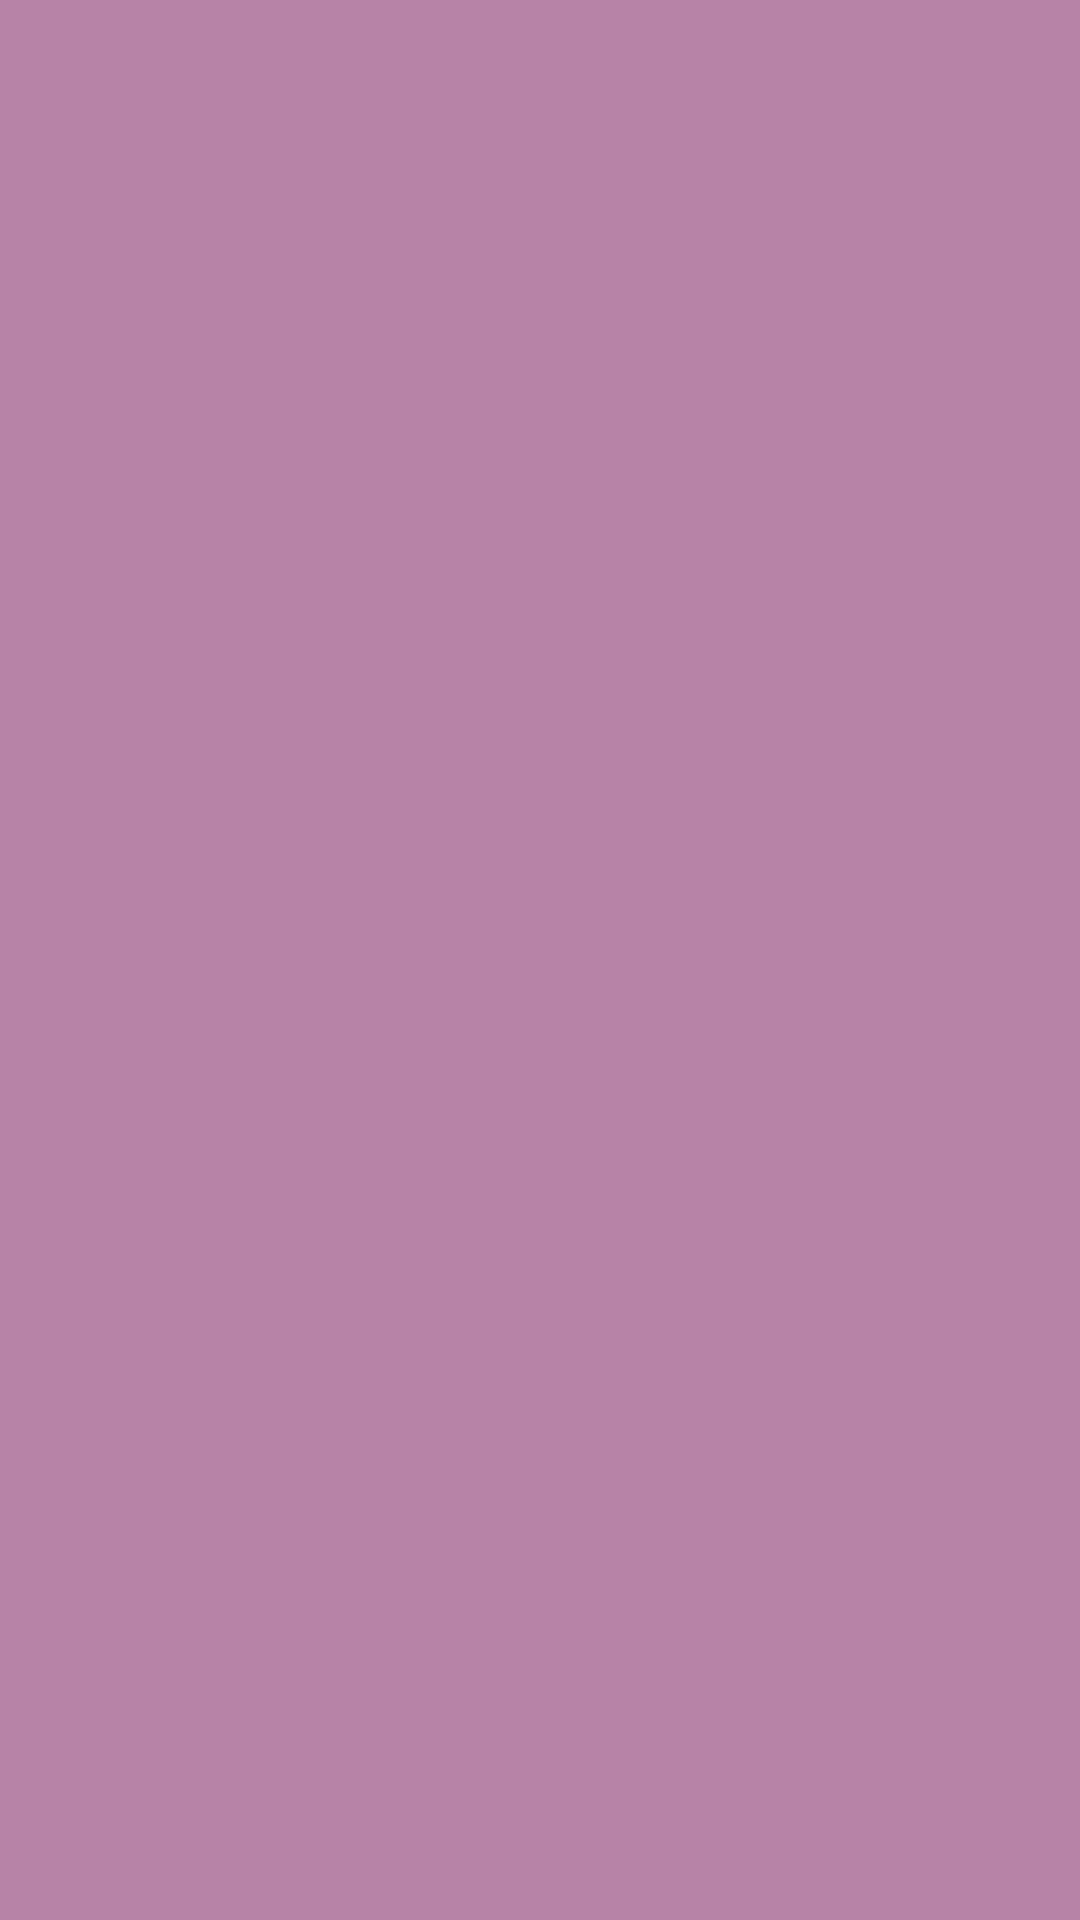 1080x1920 Opera Mauve Solid Color Background